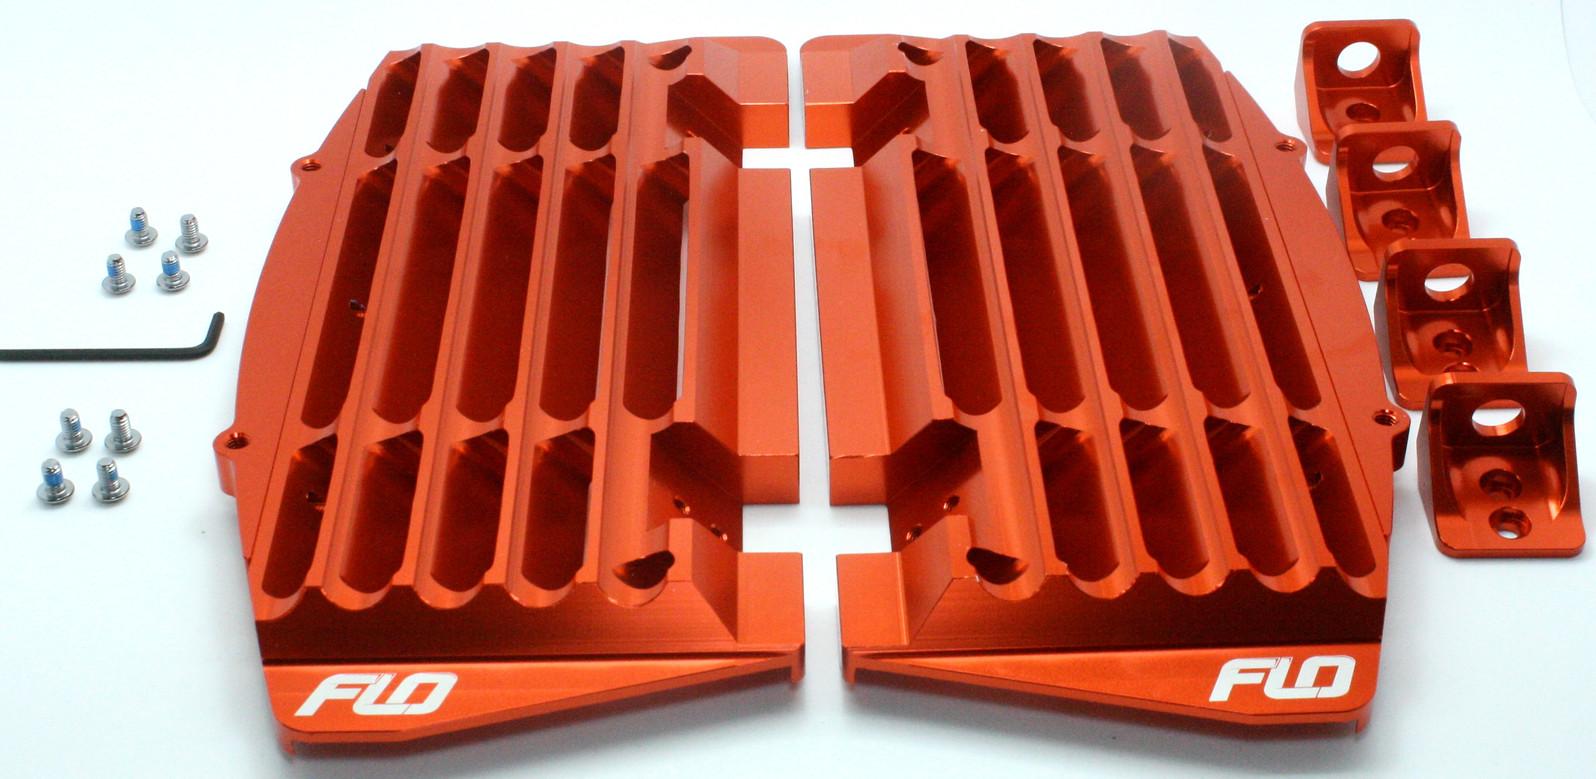 Flo Motorsports Best KTM / Husqvarna Radiator Guards / Brace  kt16 guard 2